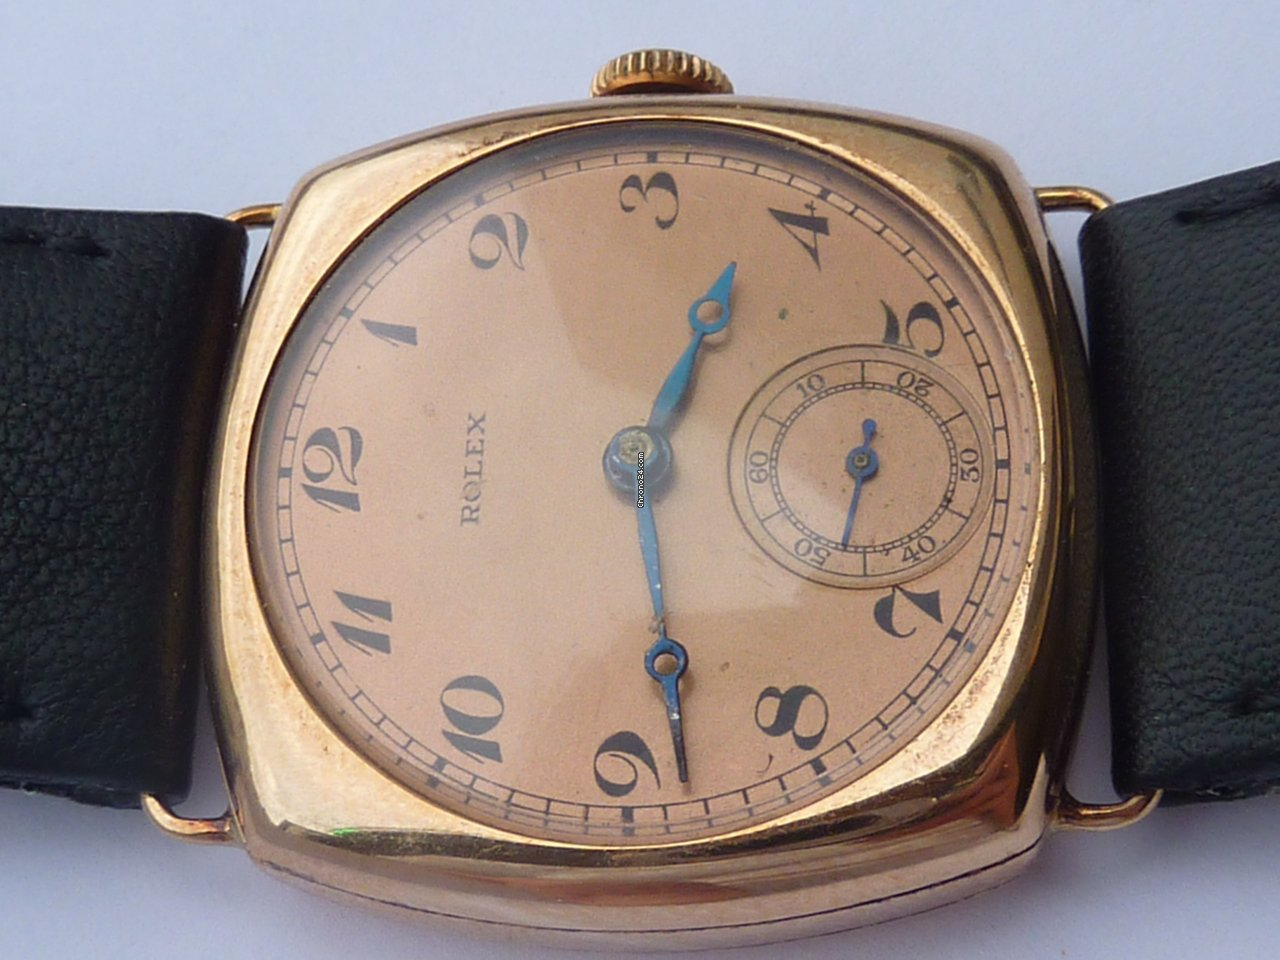 rolex cushion solid gold 585 for watchmaker f r. Black Bedroom Furniture Sets. Home Design Ideas